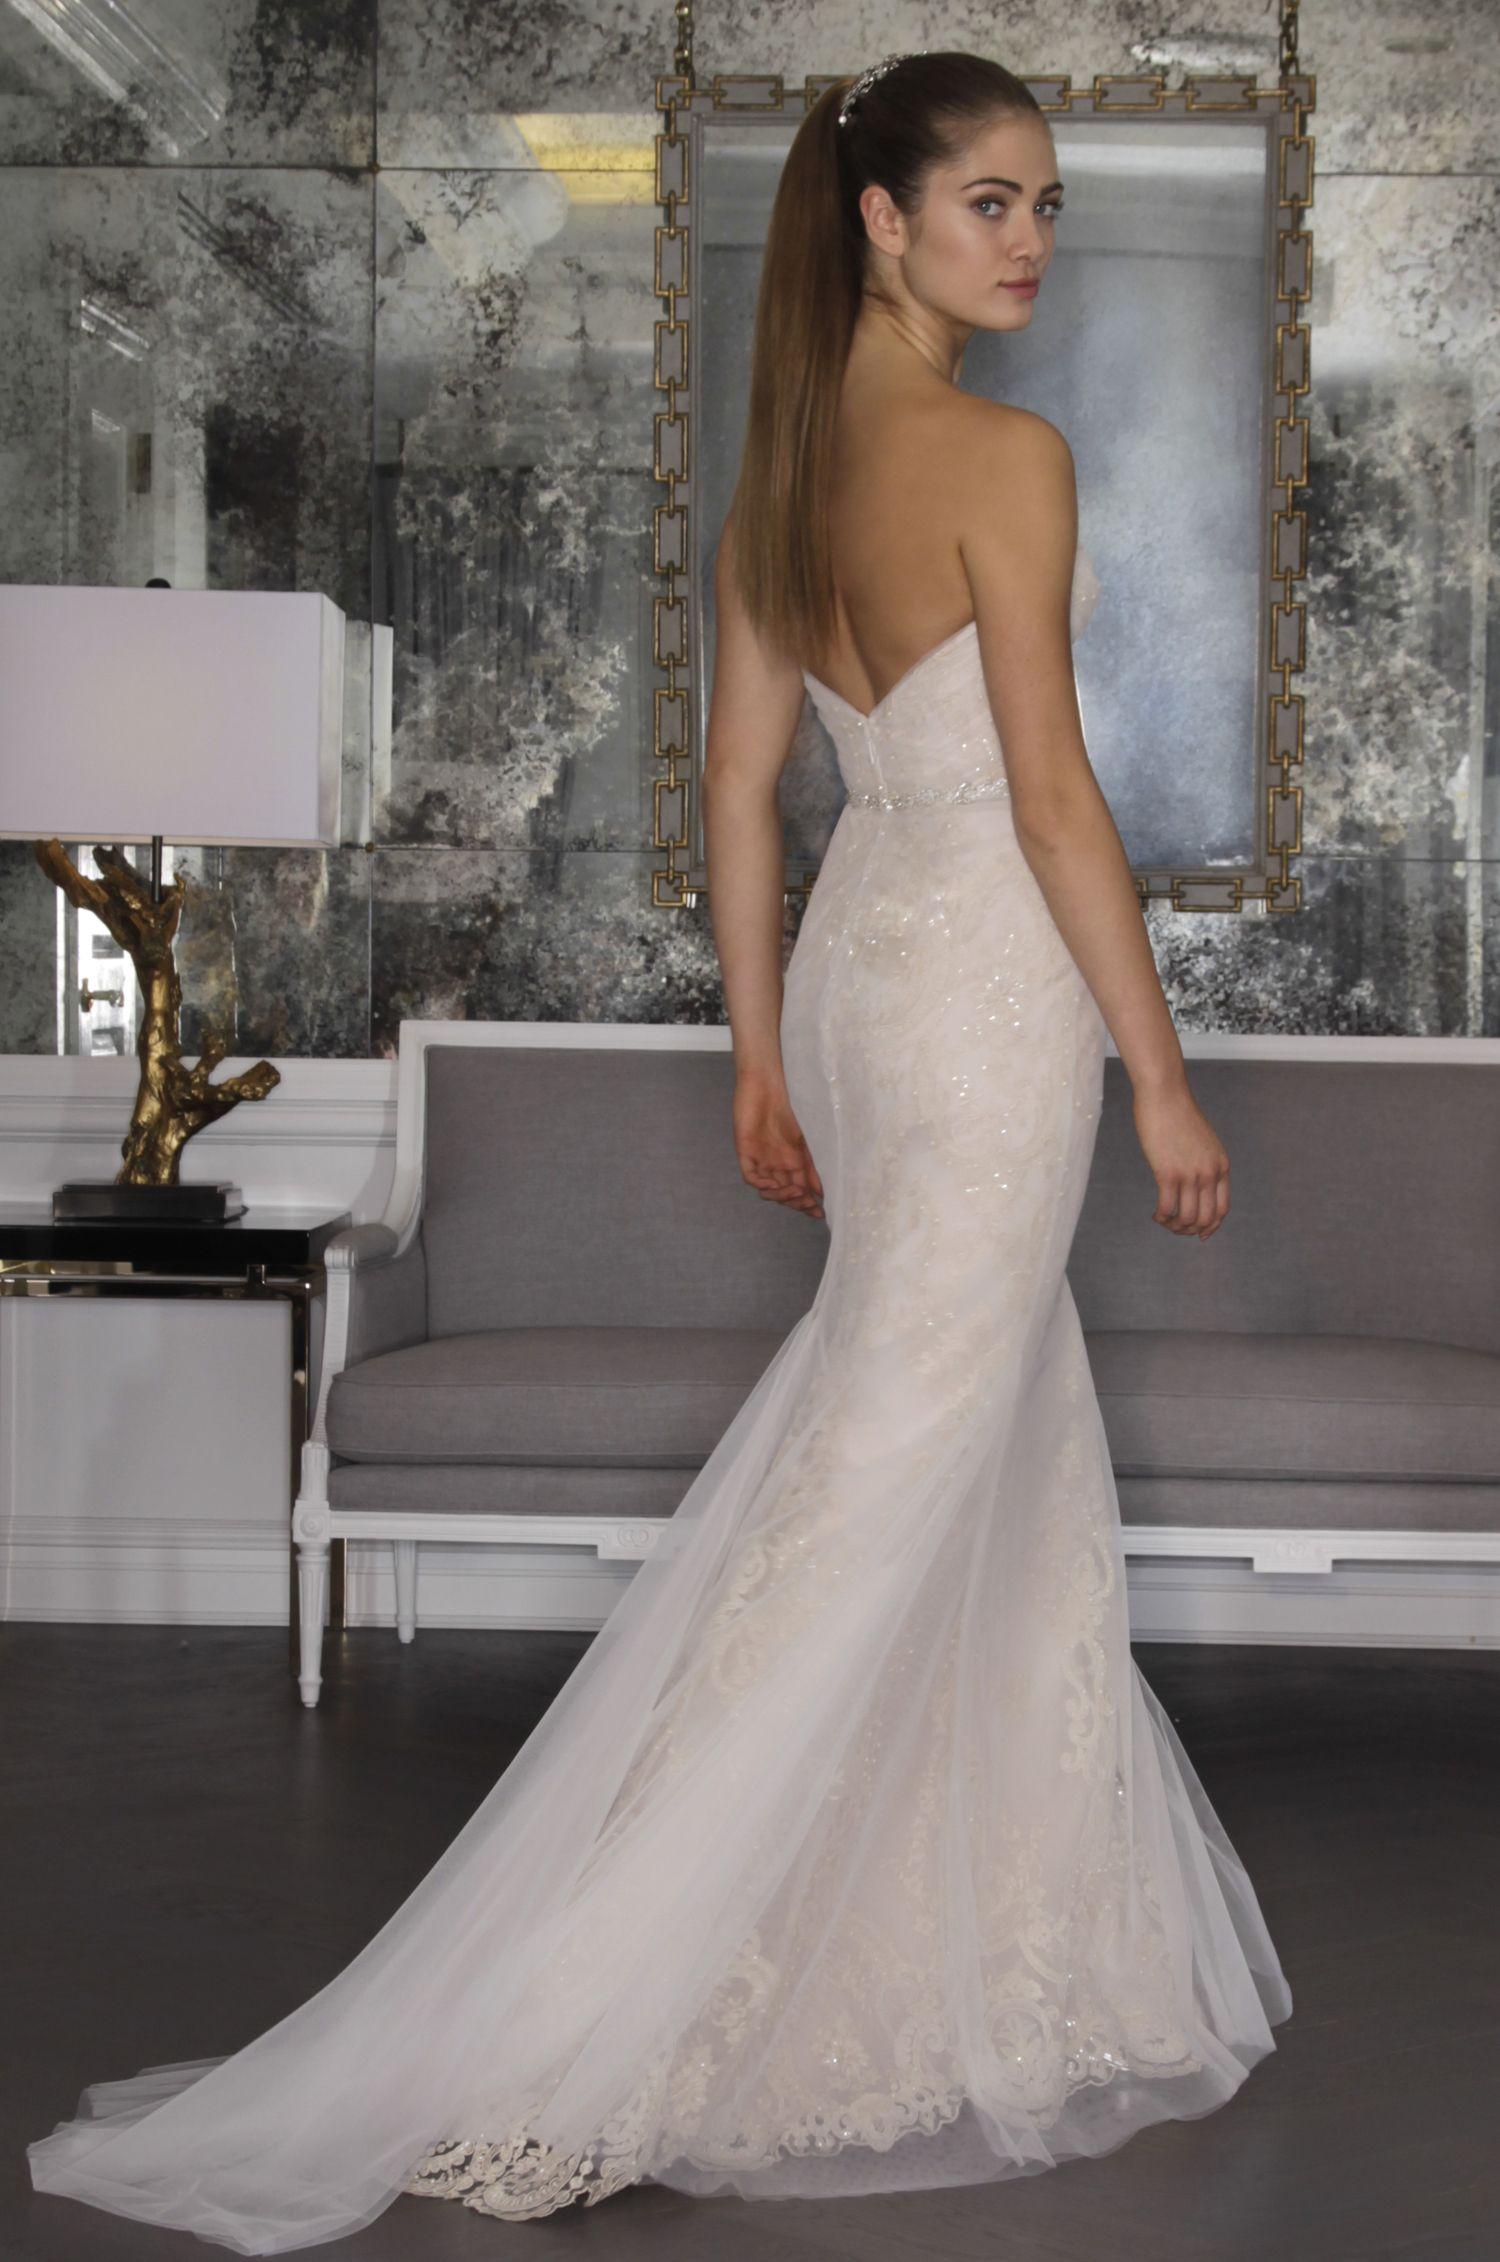 Romona keveza luxe bridal style rk wedding dress pinterest